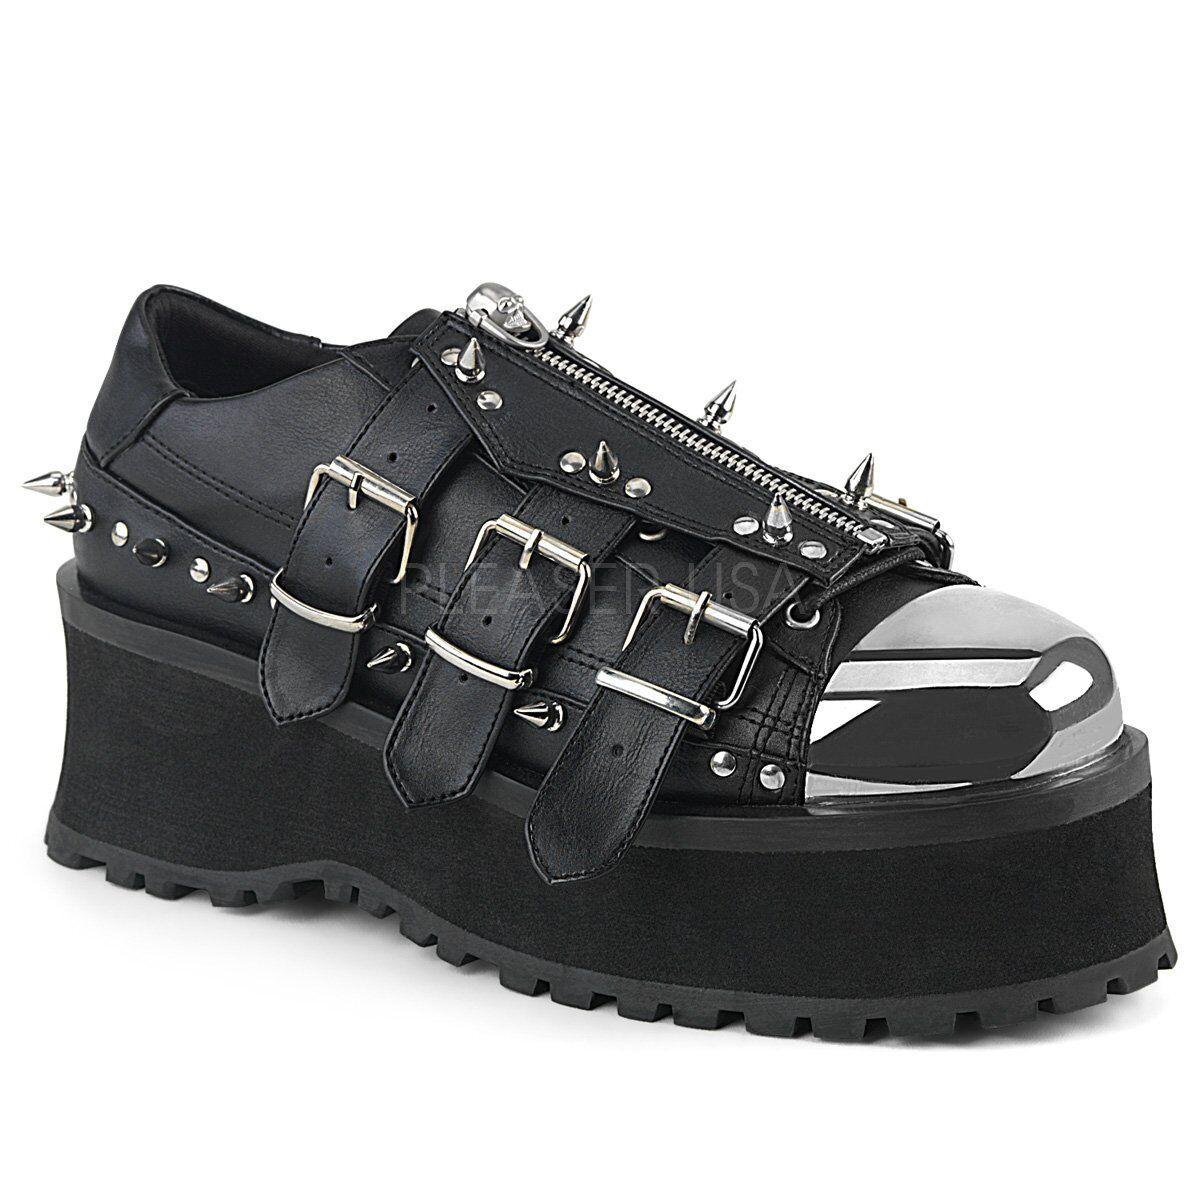 Demonia Mens Gothic Goth Punk Rock Metal Spikes Metal Toe Vegan Platform chaussures